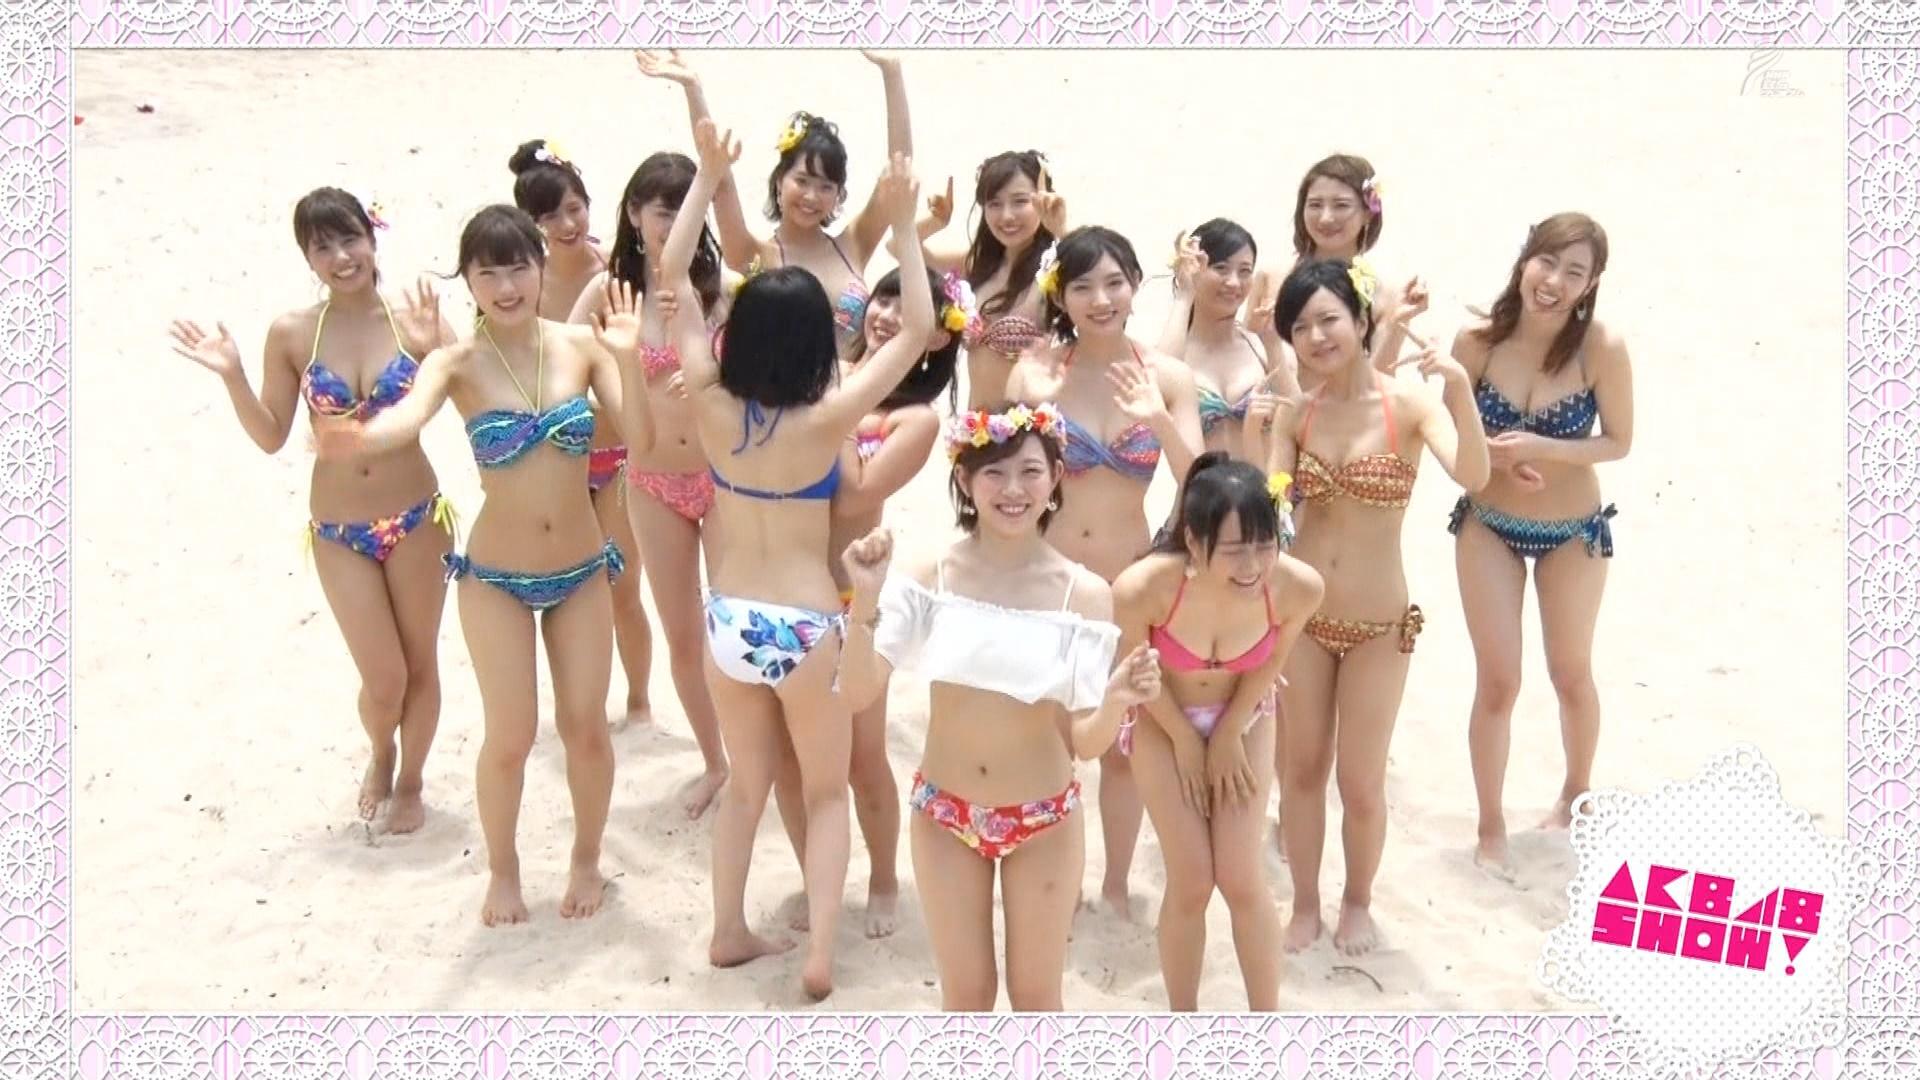 NMB48★5023©2ch.netYouTube動画>7本 ->画像>208枚